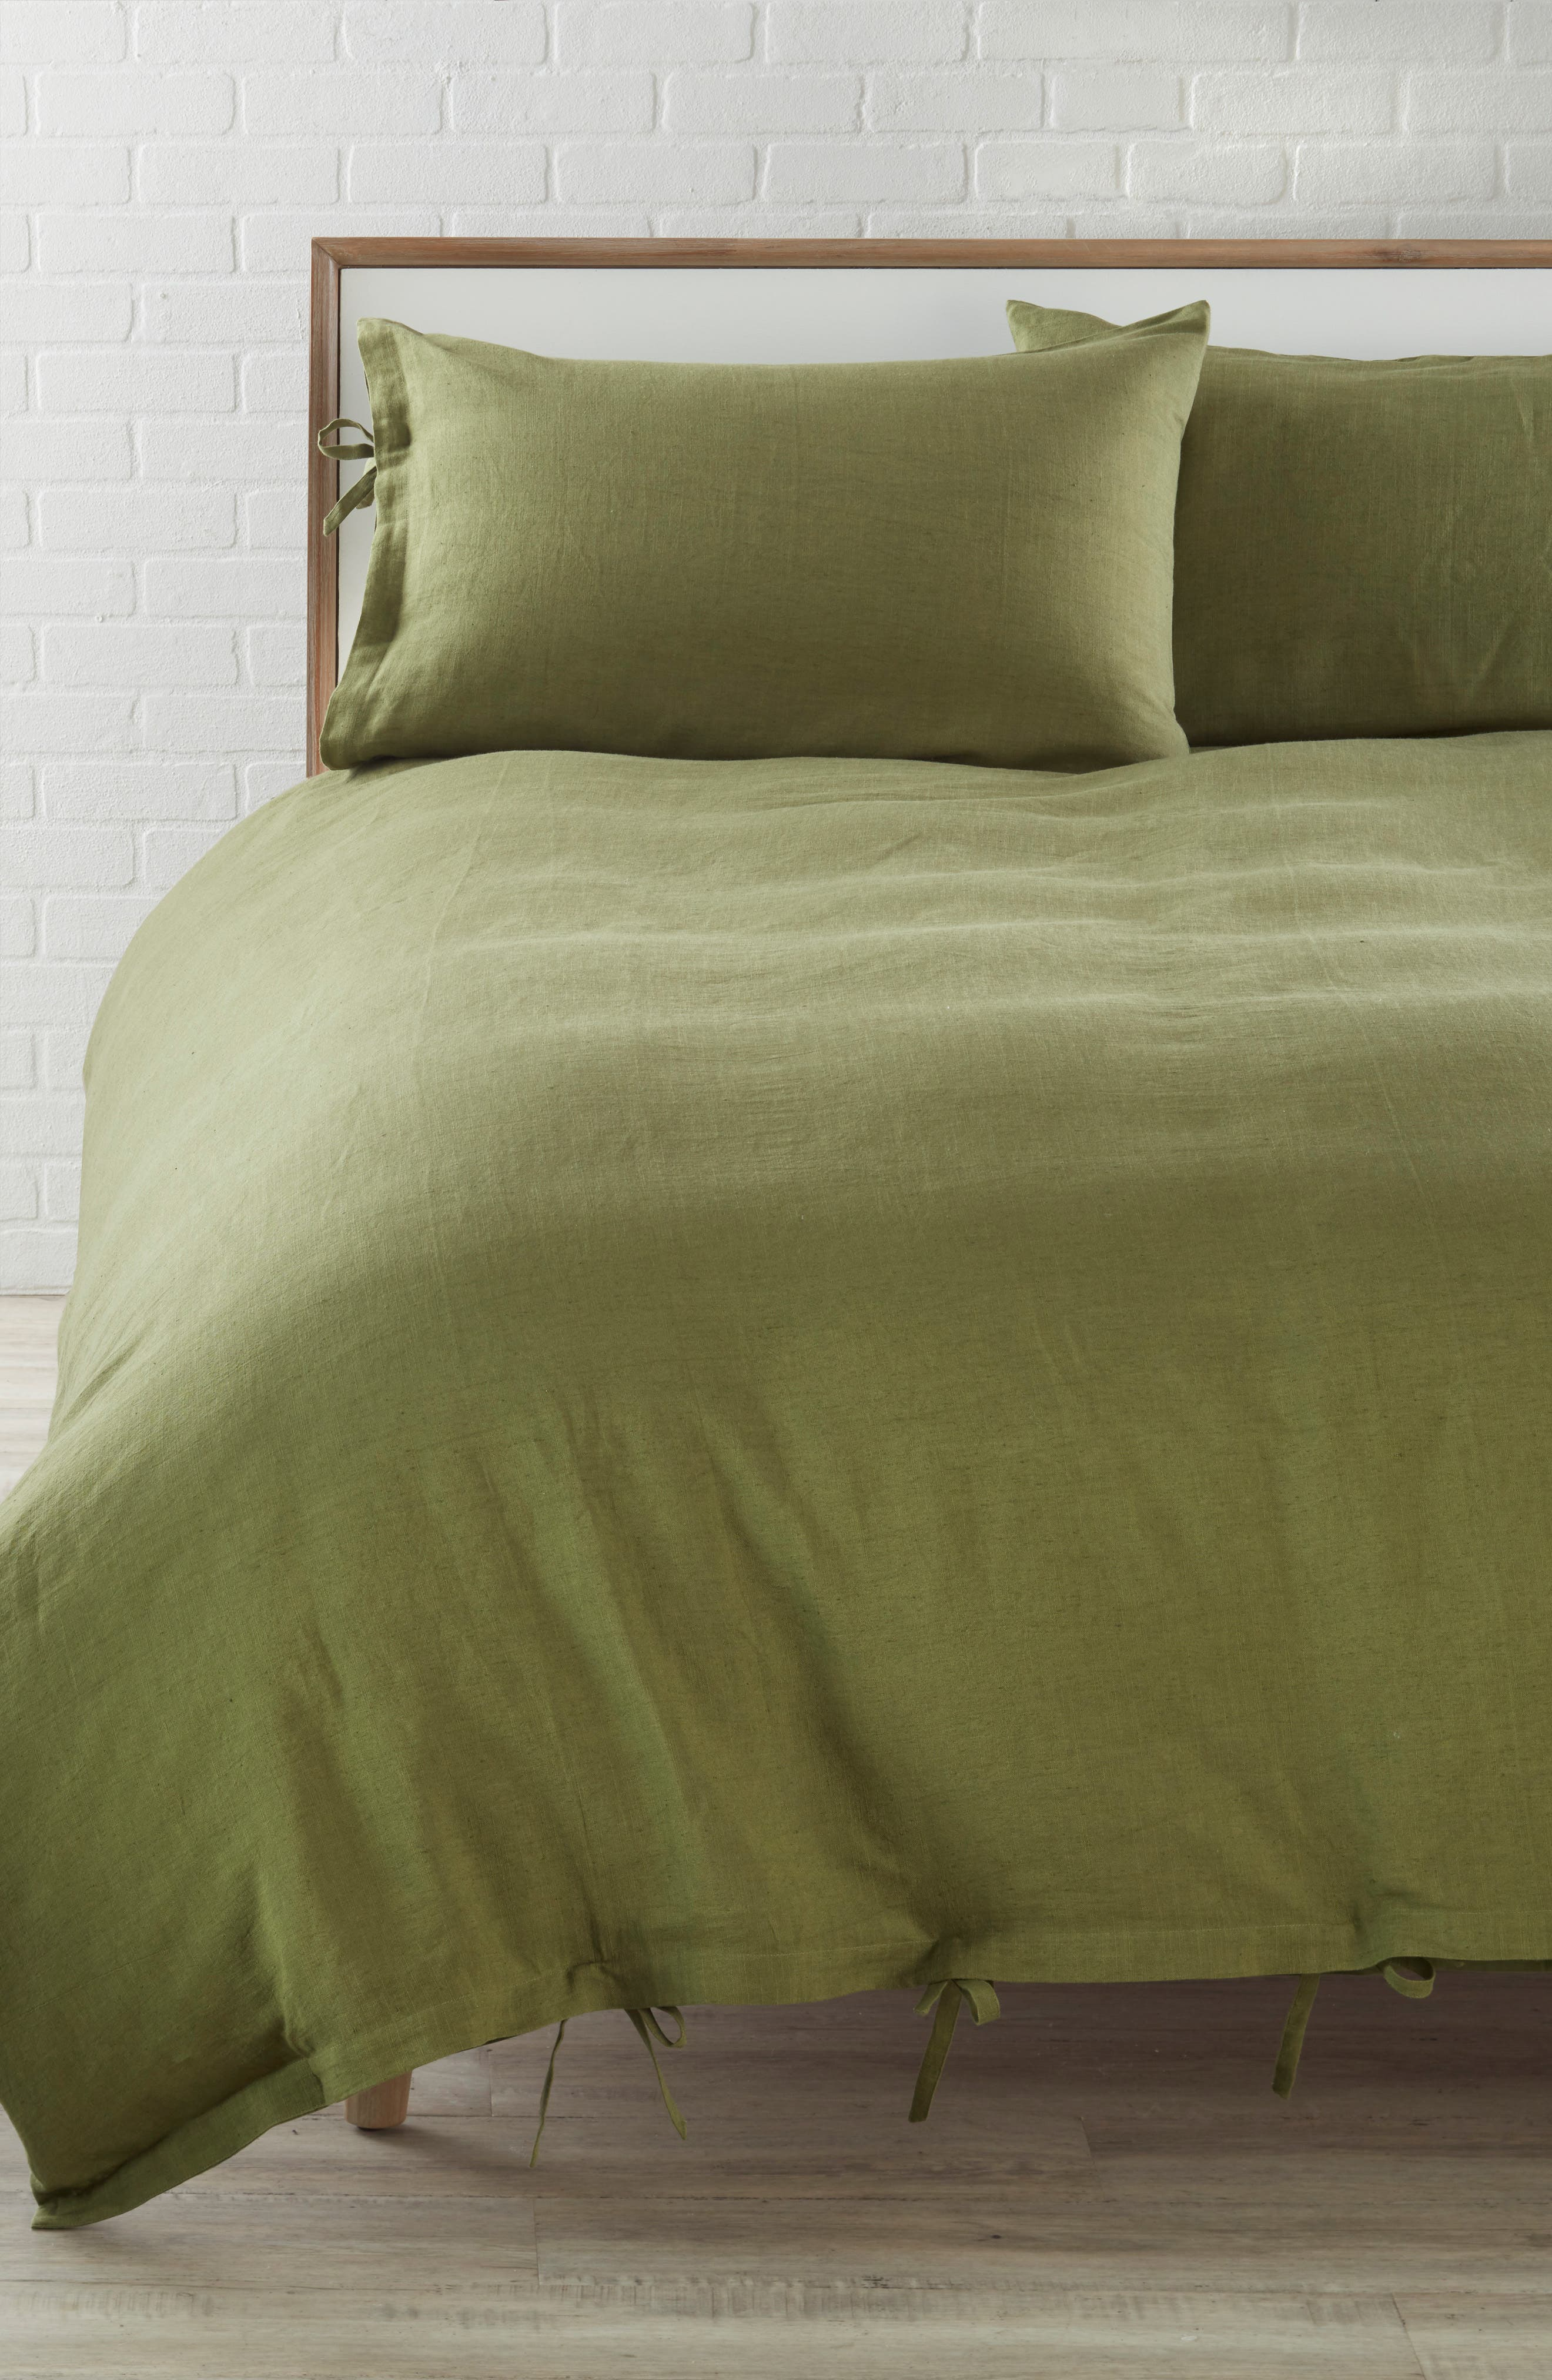 TREASURE & BOND Relaxed Cotton & Linen Duvet Cover, Main, color, OLIVE SPICE